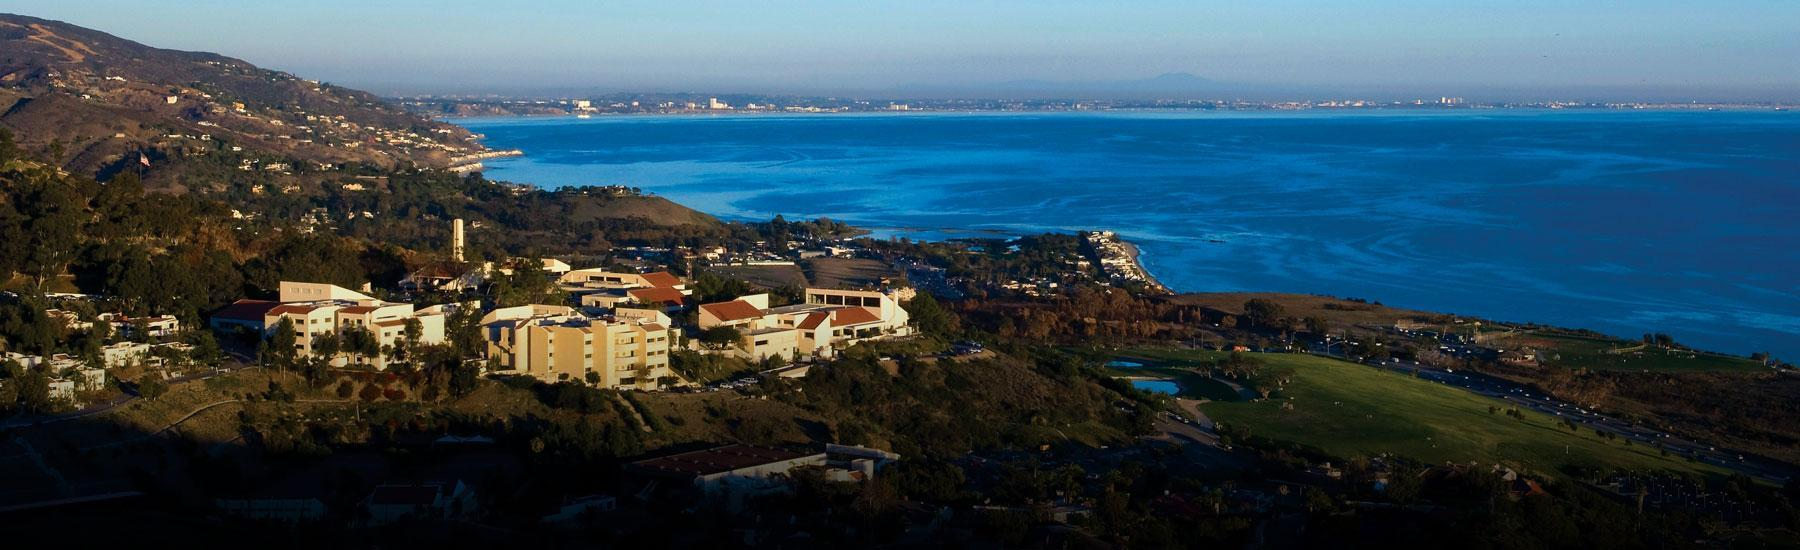 Pepperdine University    Faculty Professor of Wealth Management   Malibu, CA